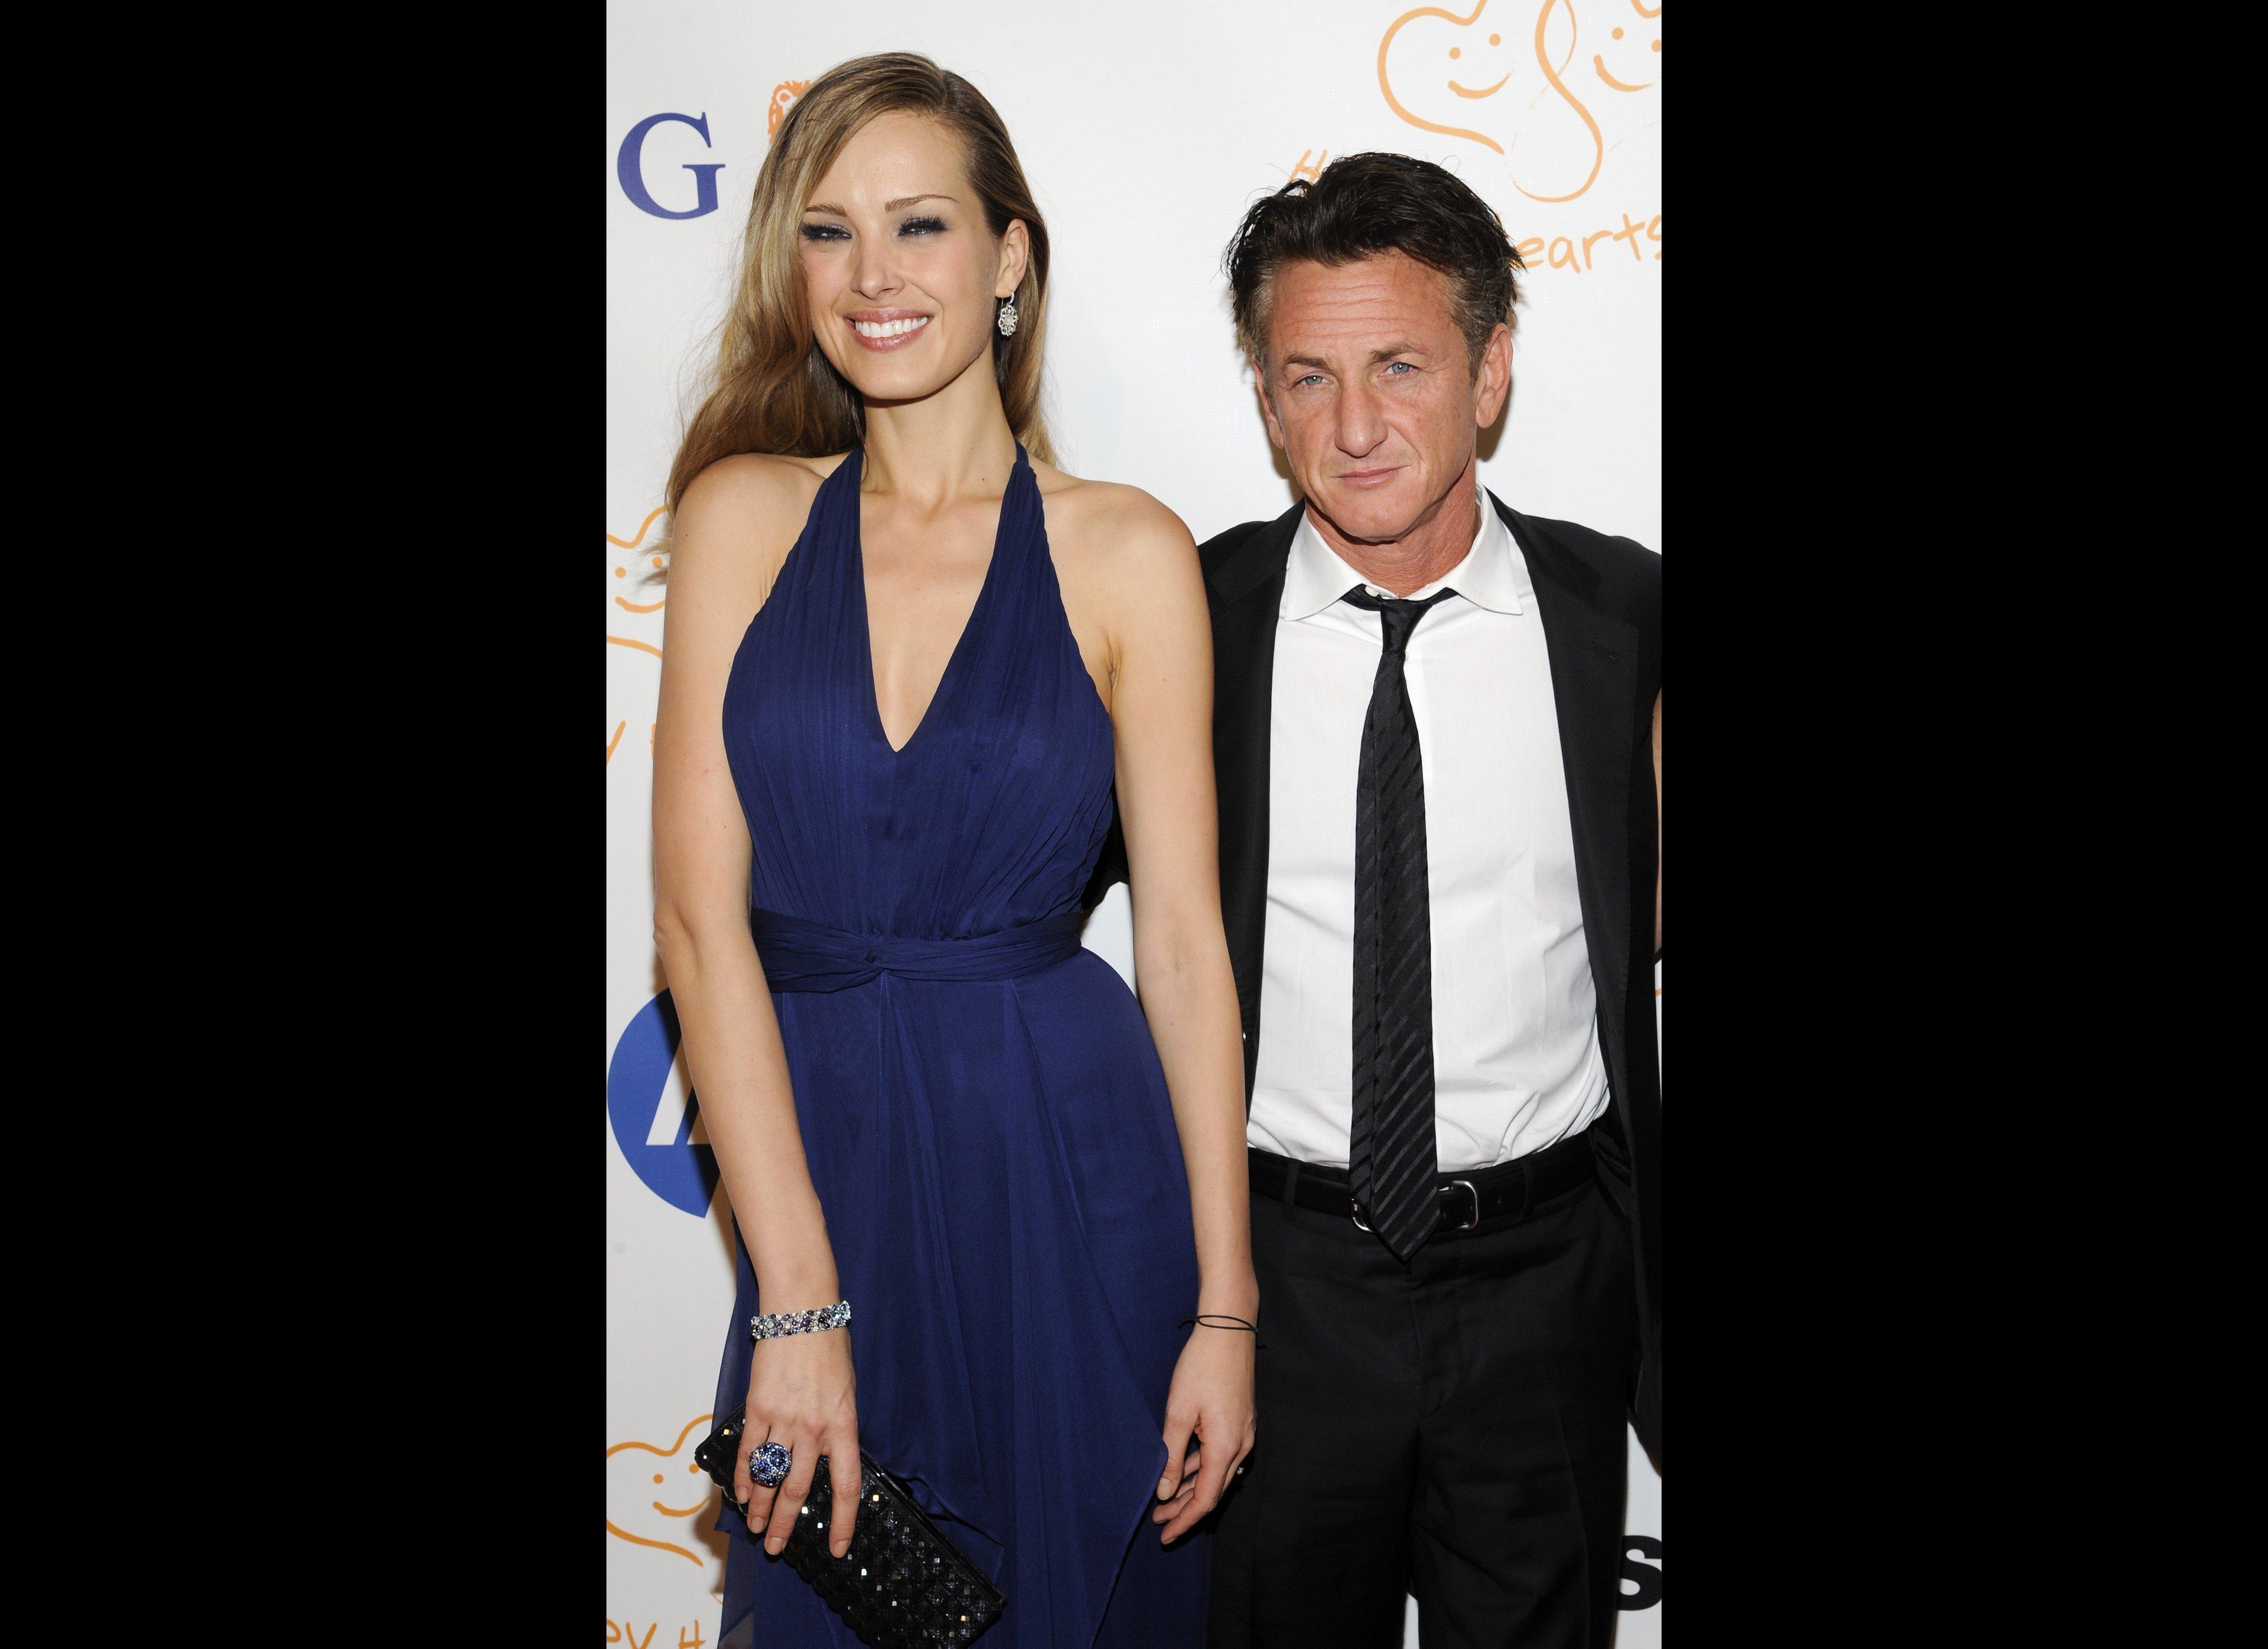 Petra Nemcova dating Sean Penn